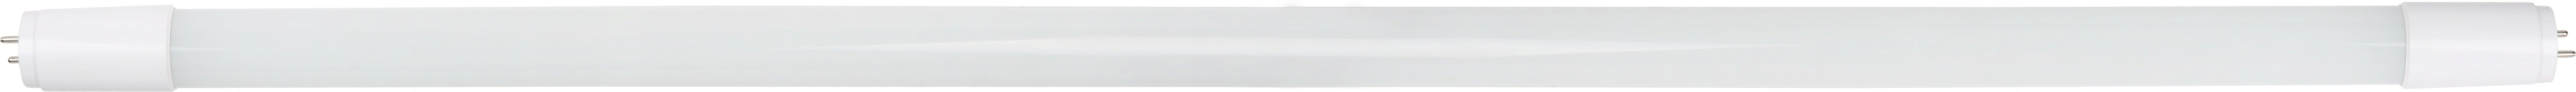 Luminária LAMP LED TUBE 9W 6,5K GLASS  REF:11417